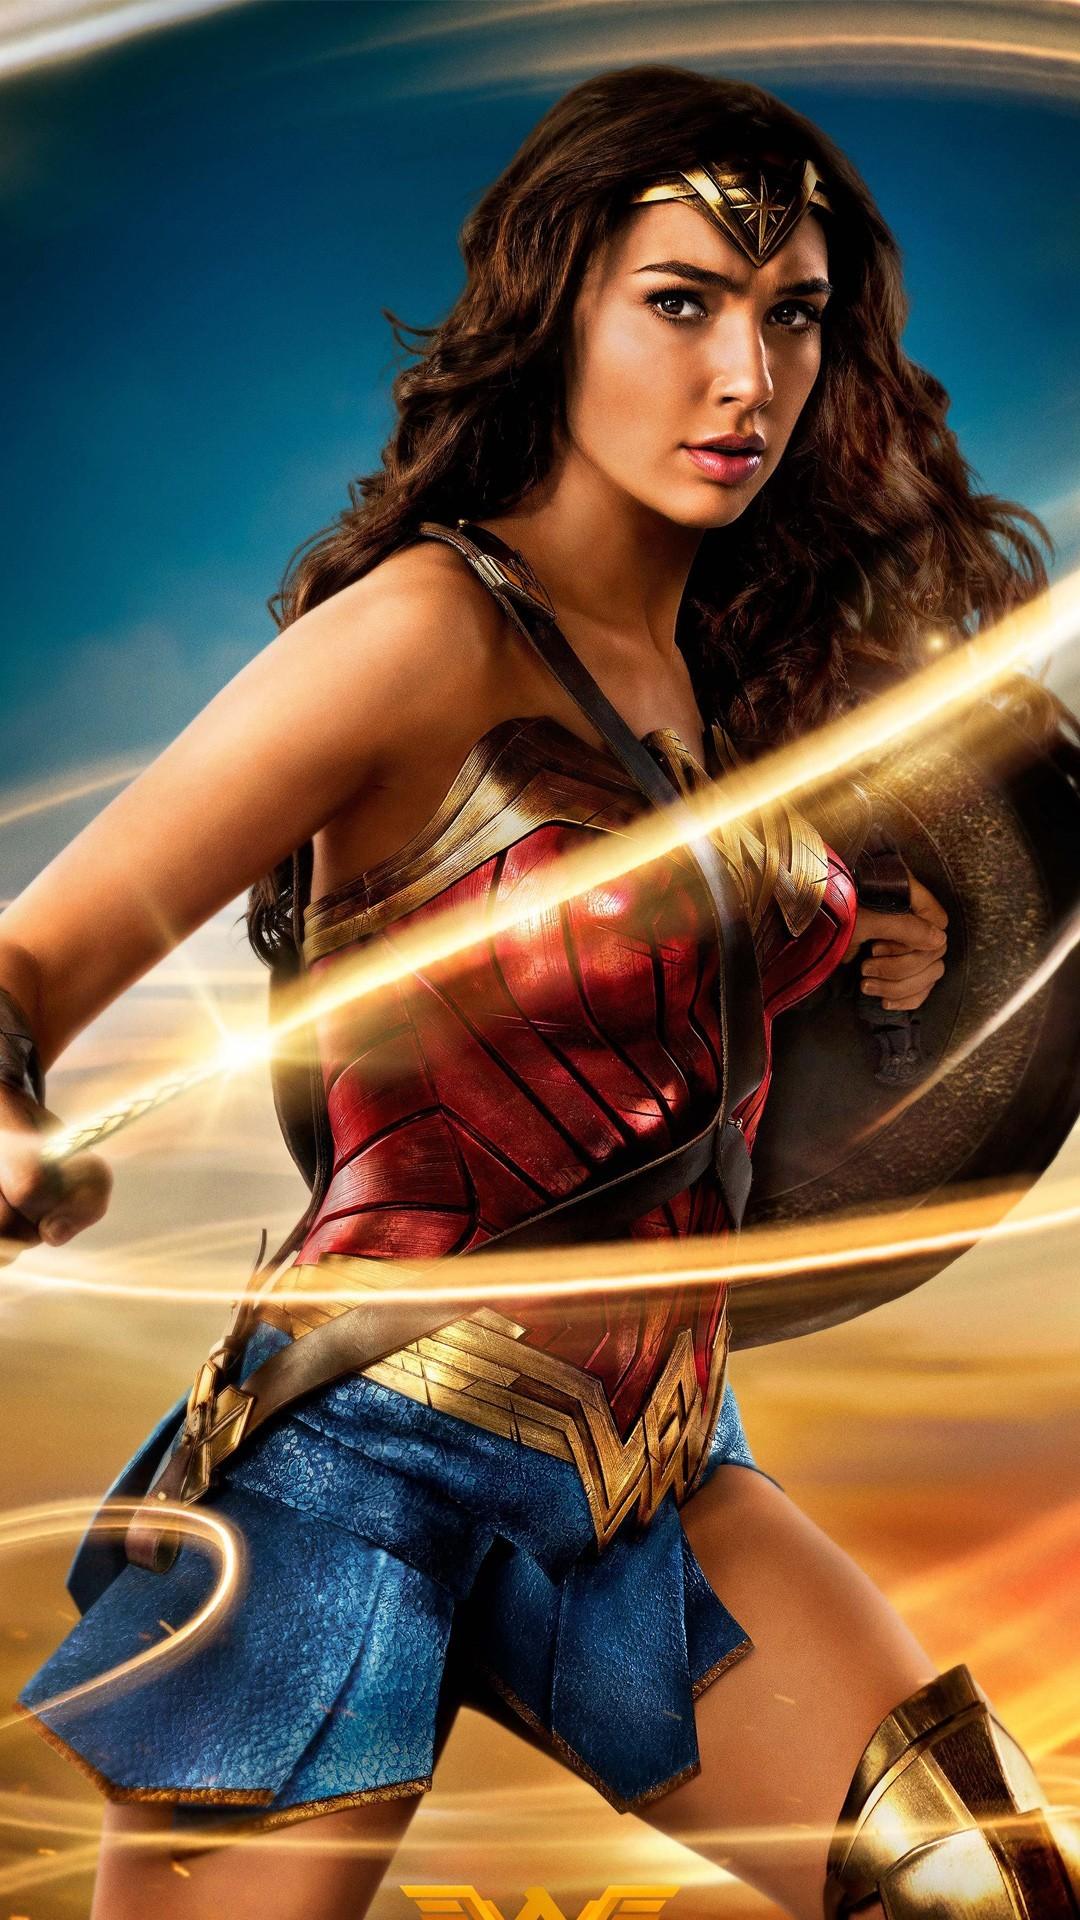 Gal Gadot Wonder Woman Wallpaper For Mobile Resolution Gal